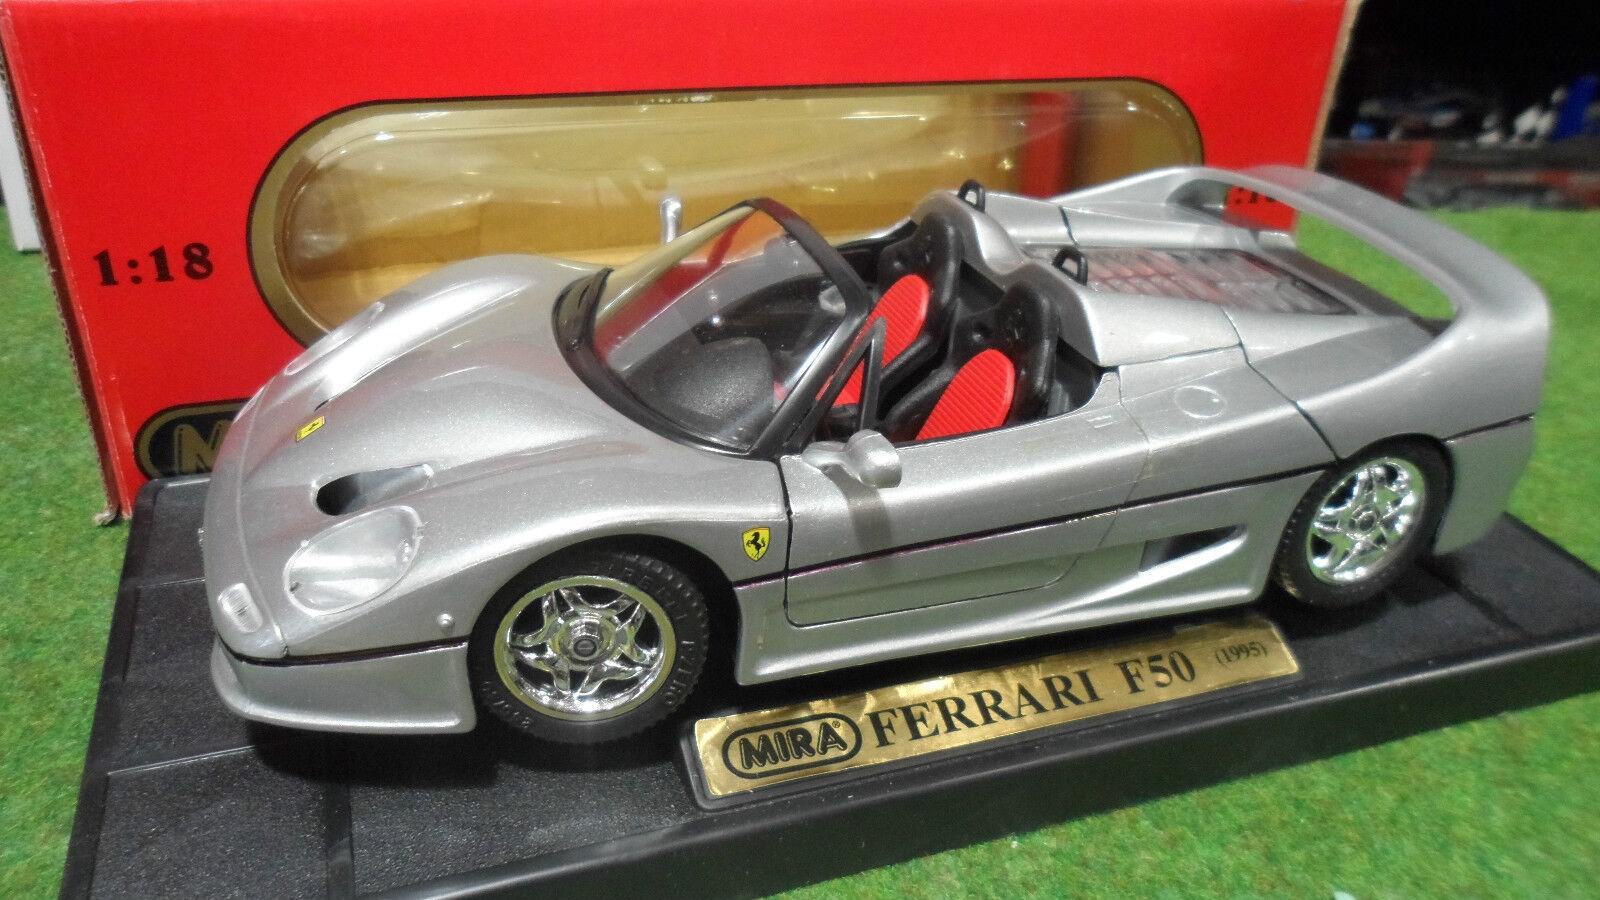 FERRARI F50 barchetta Cabriolet 1995 1 18 MIRA 6226 voiture miniature collection